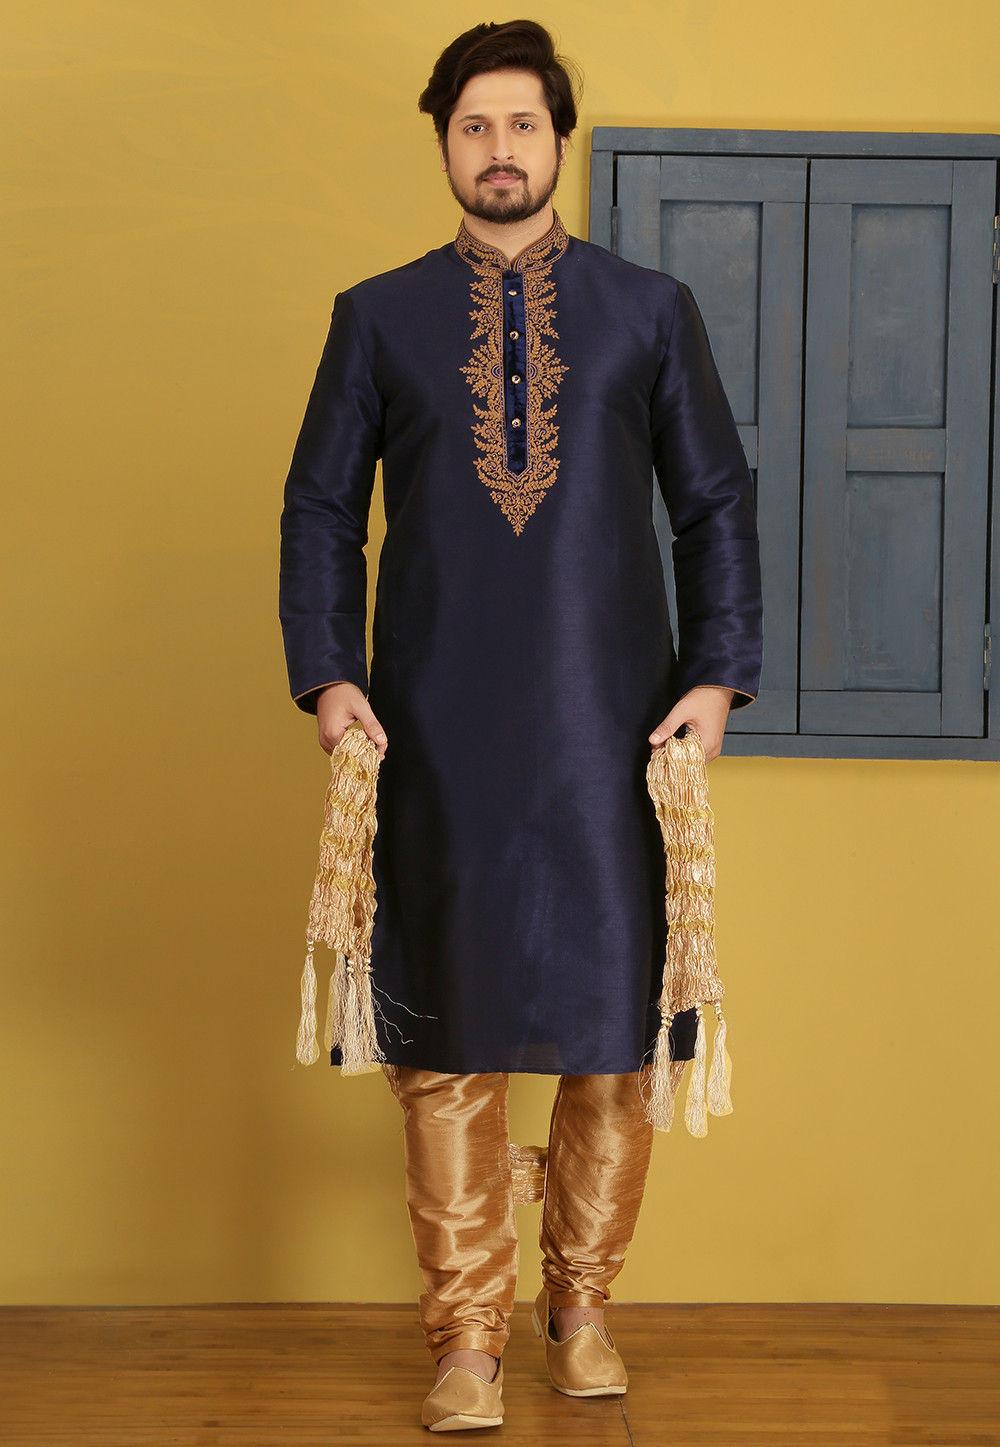 9cee8a7ce0 Embroidered Dupion Silk Kurta Pyjama in Navy Blue   MGV431